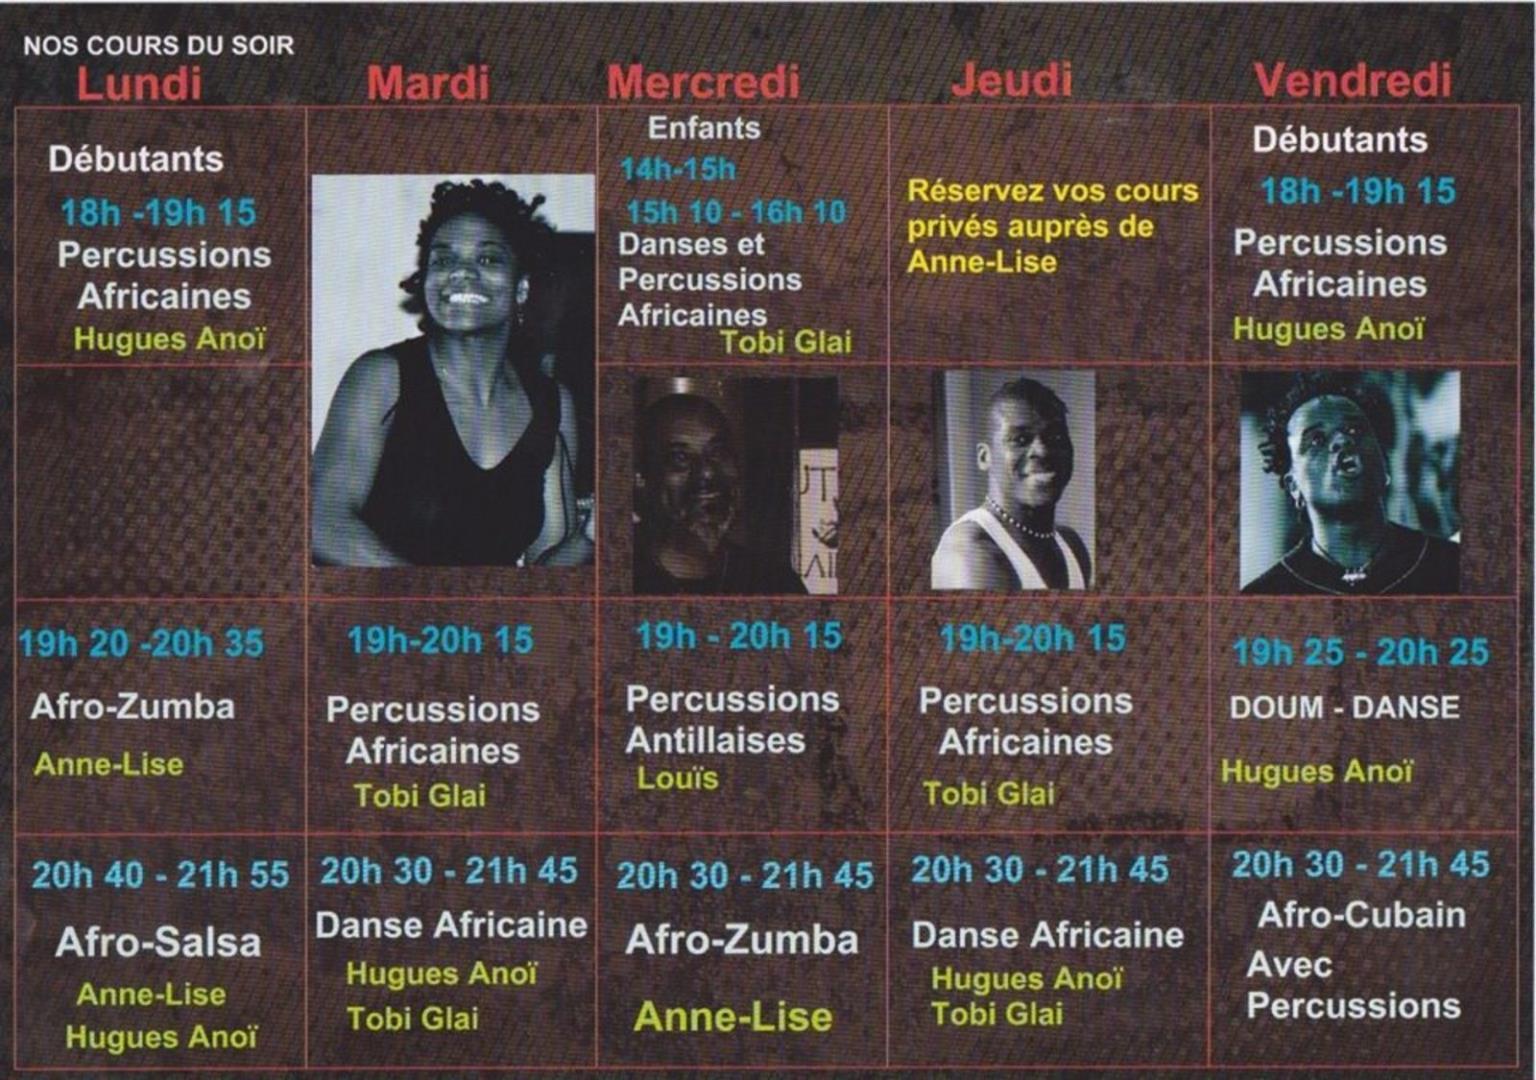 danse africaine, Afro-salsa, djembe - Idaa Dance